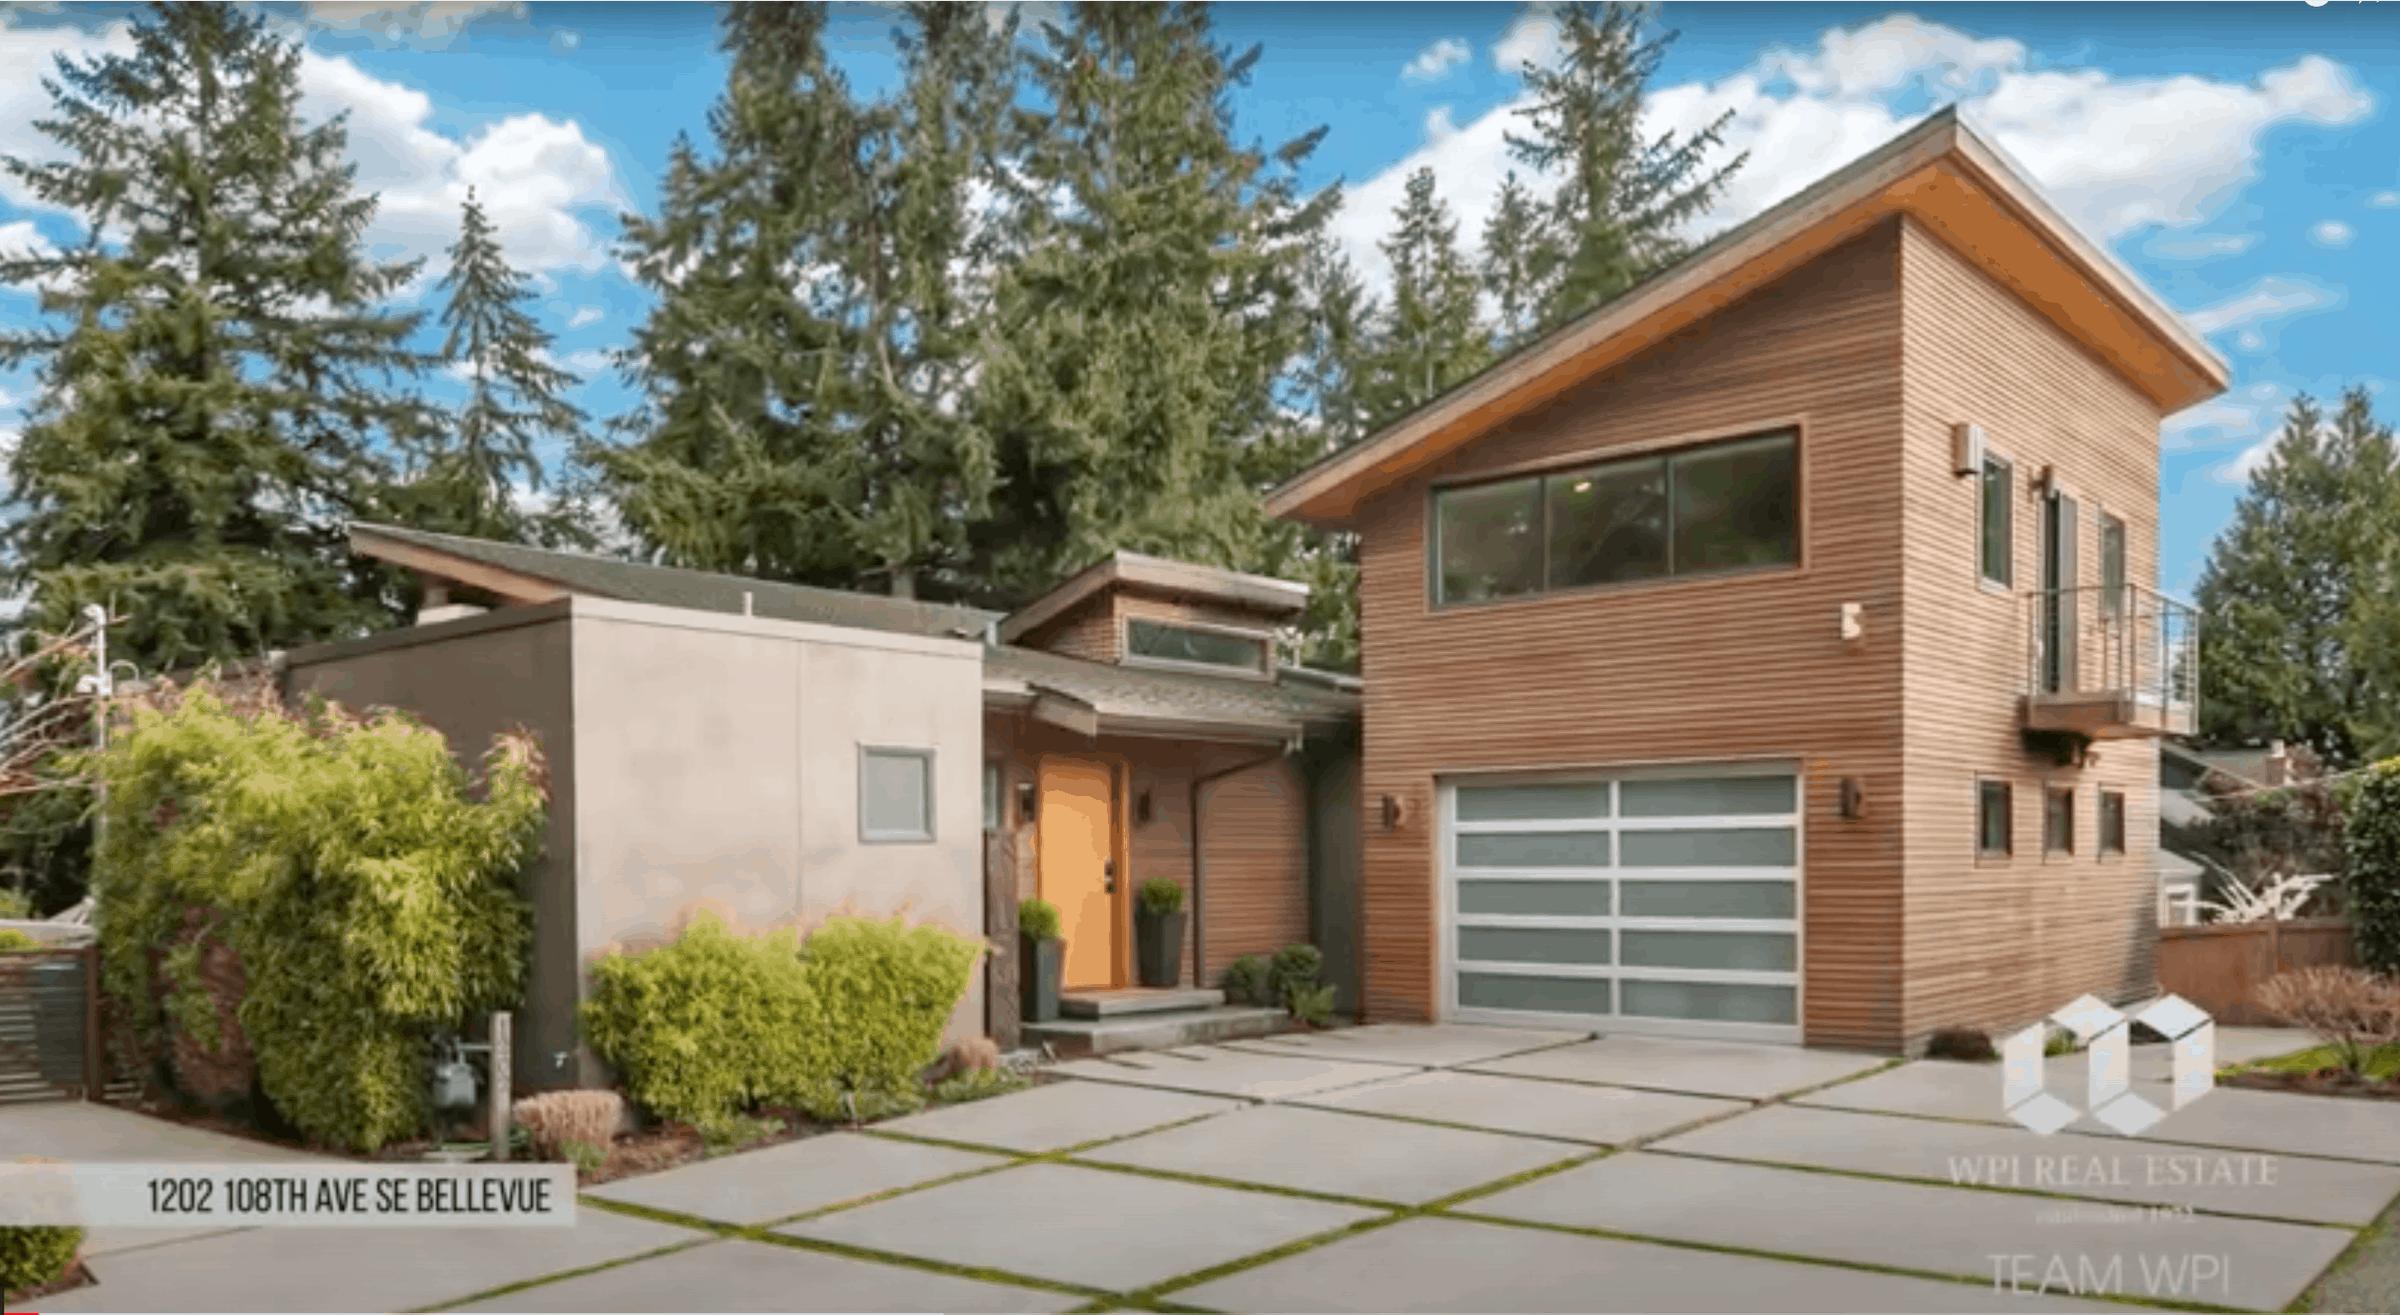 Contemporary home in Bellevue